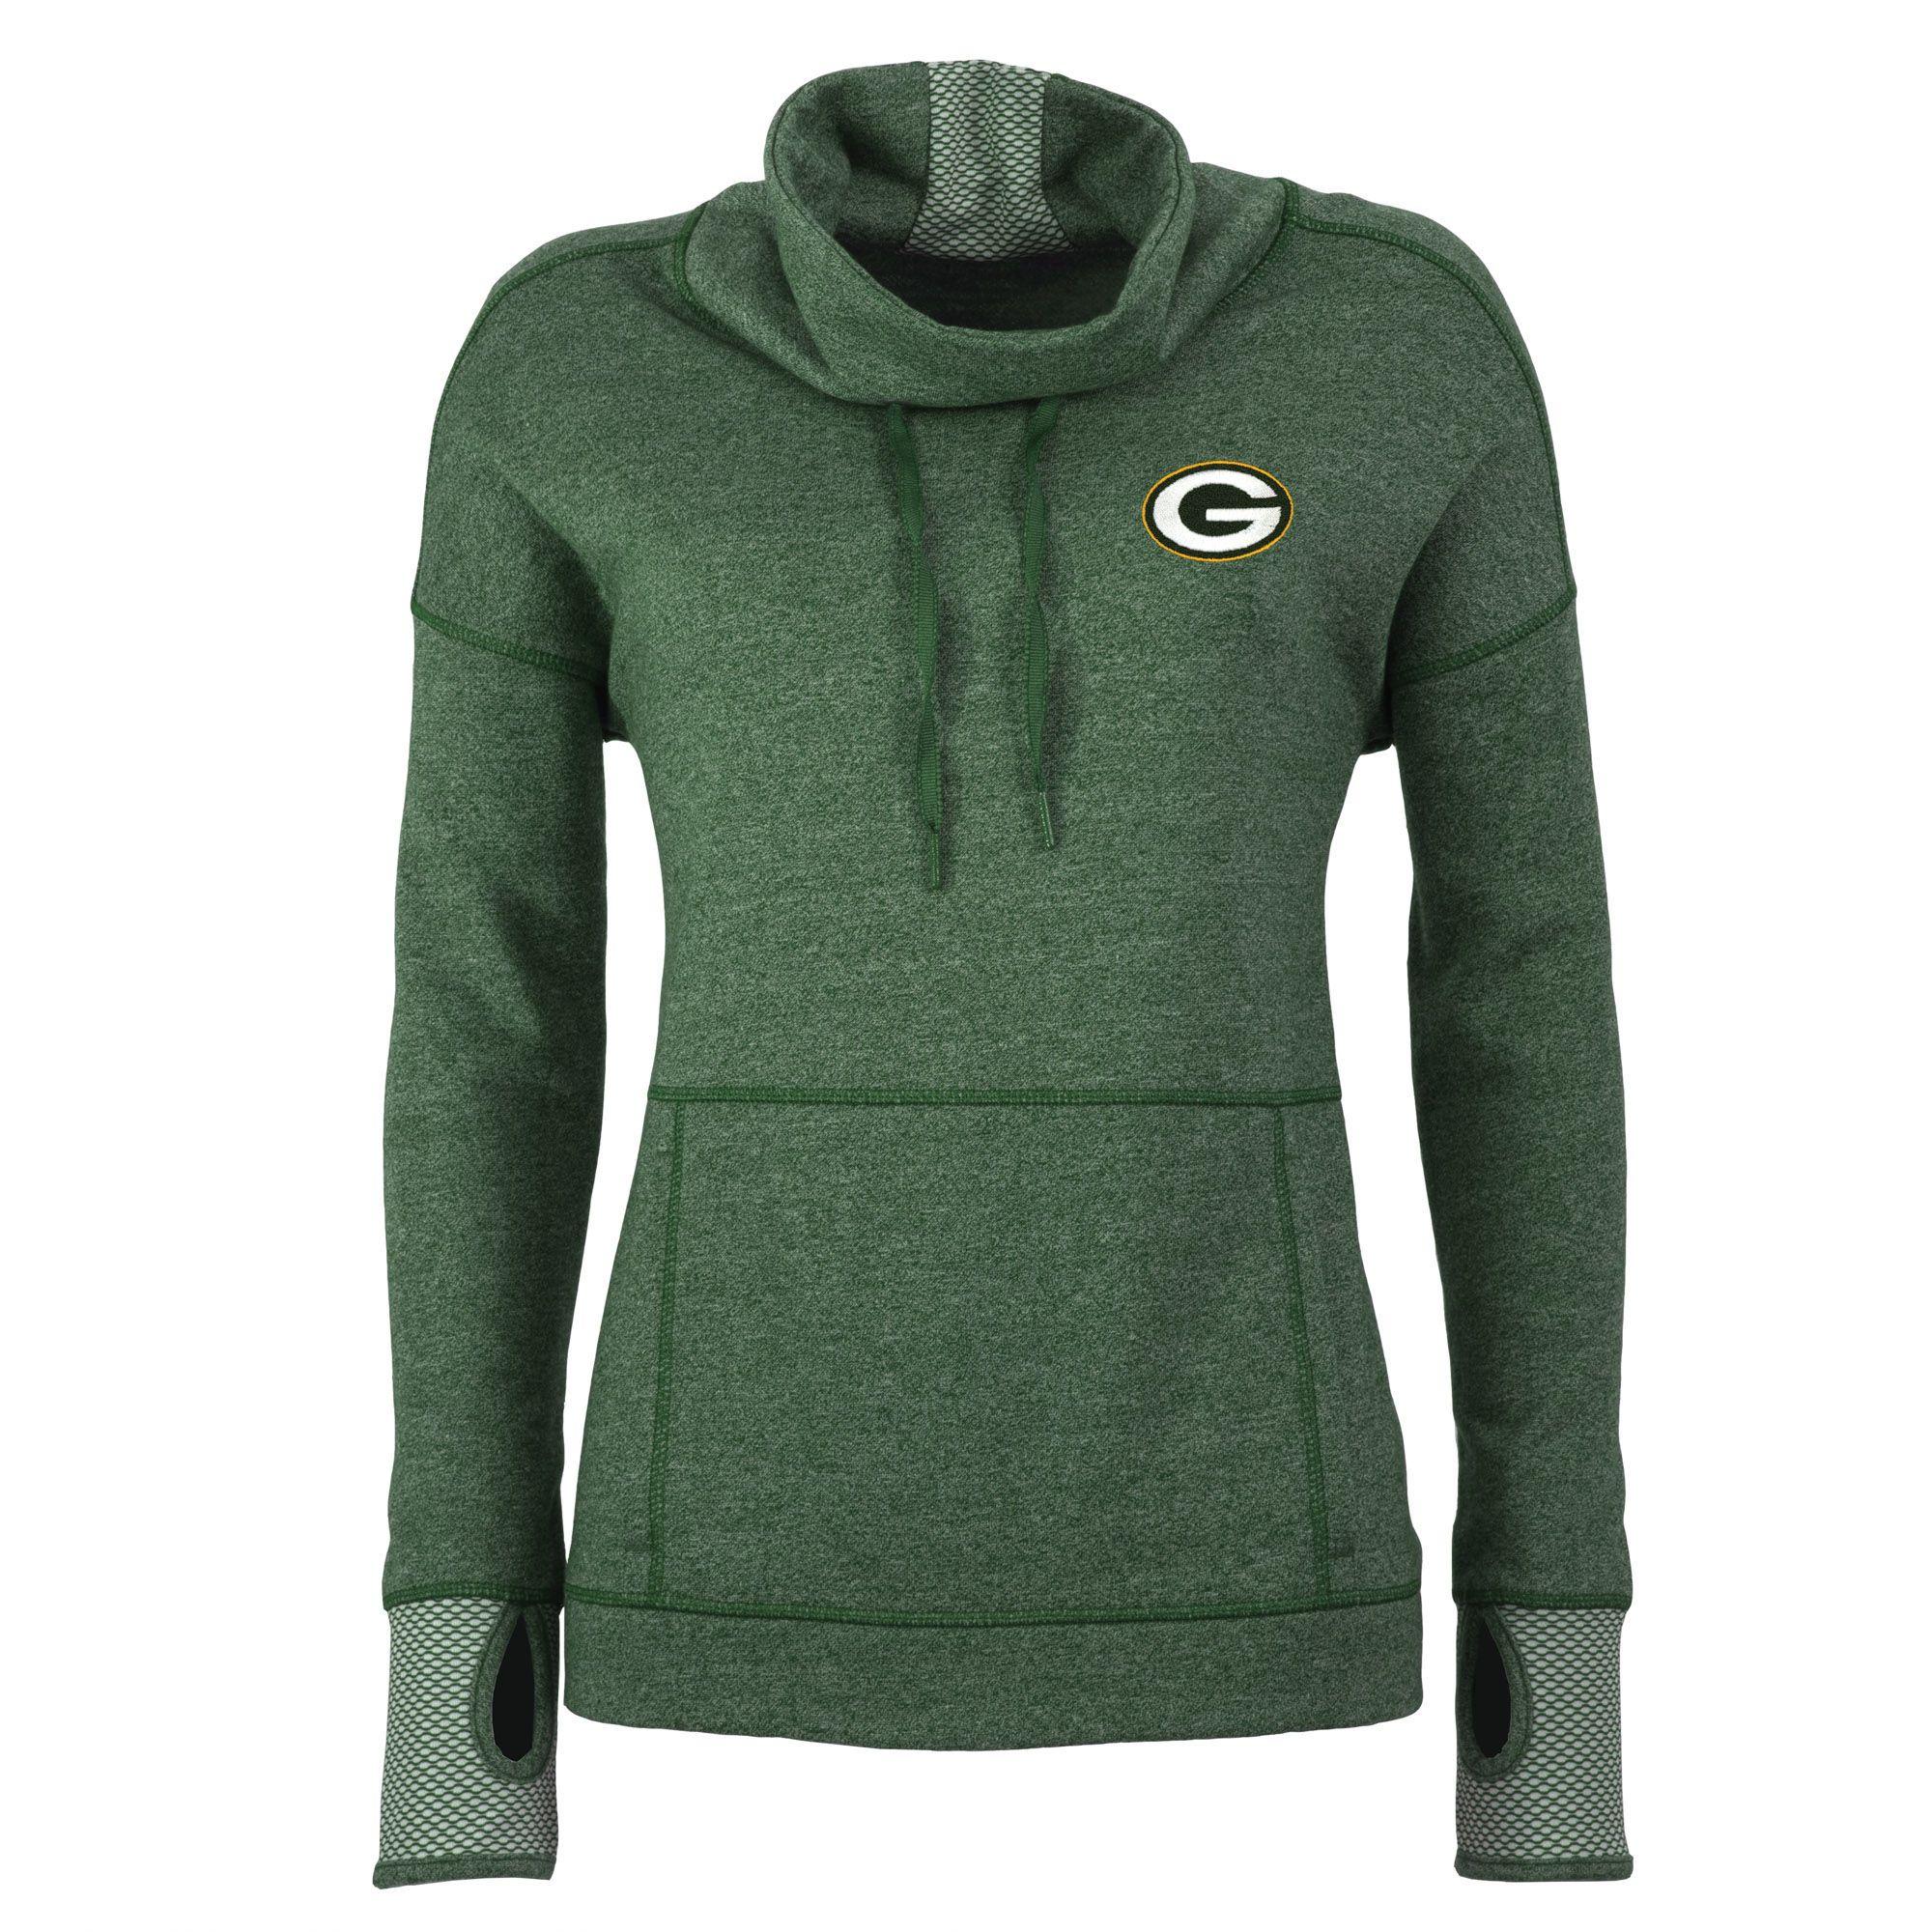 Antigua Green Bay Packers Women s Green Snap Cowl Neck Pullover Sweatshirt 339c4007d